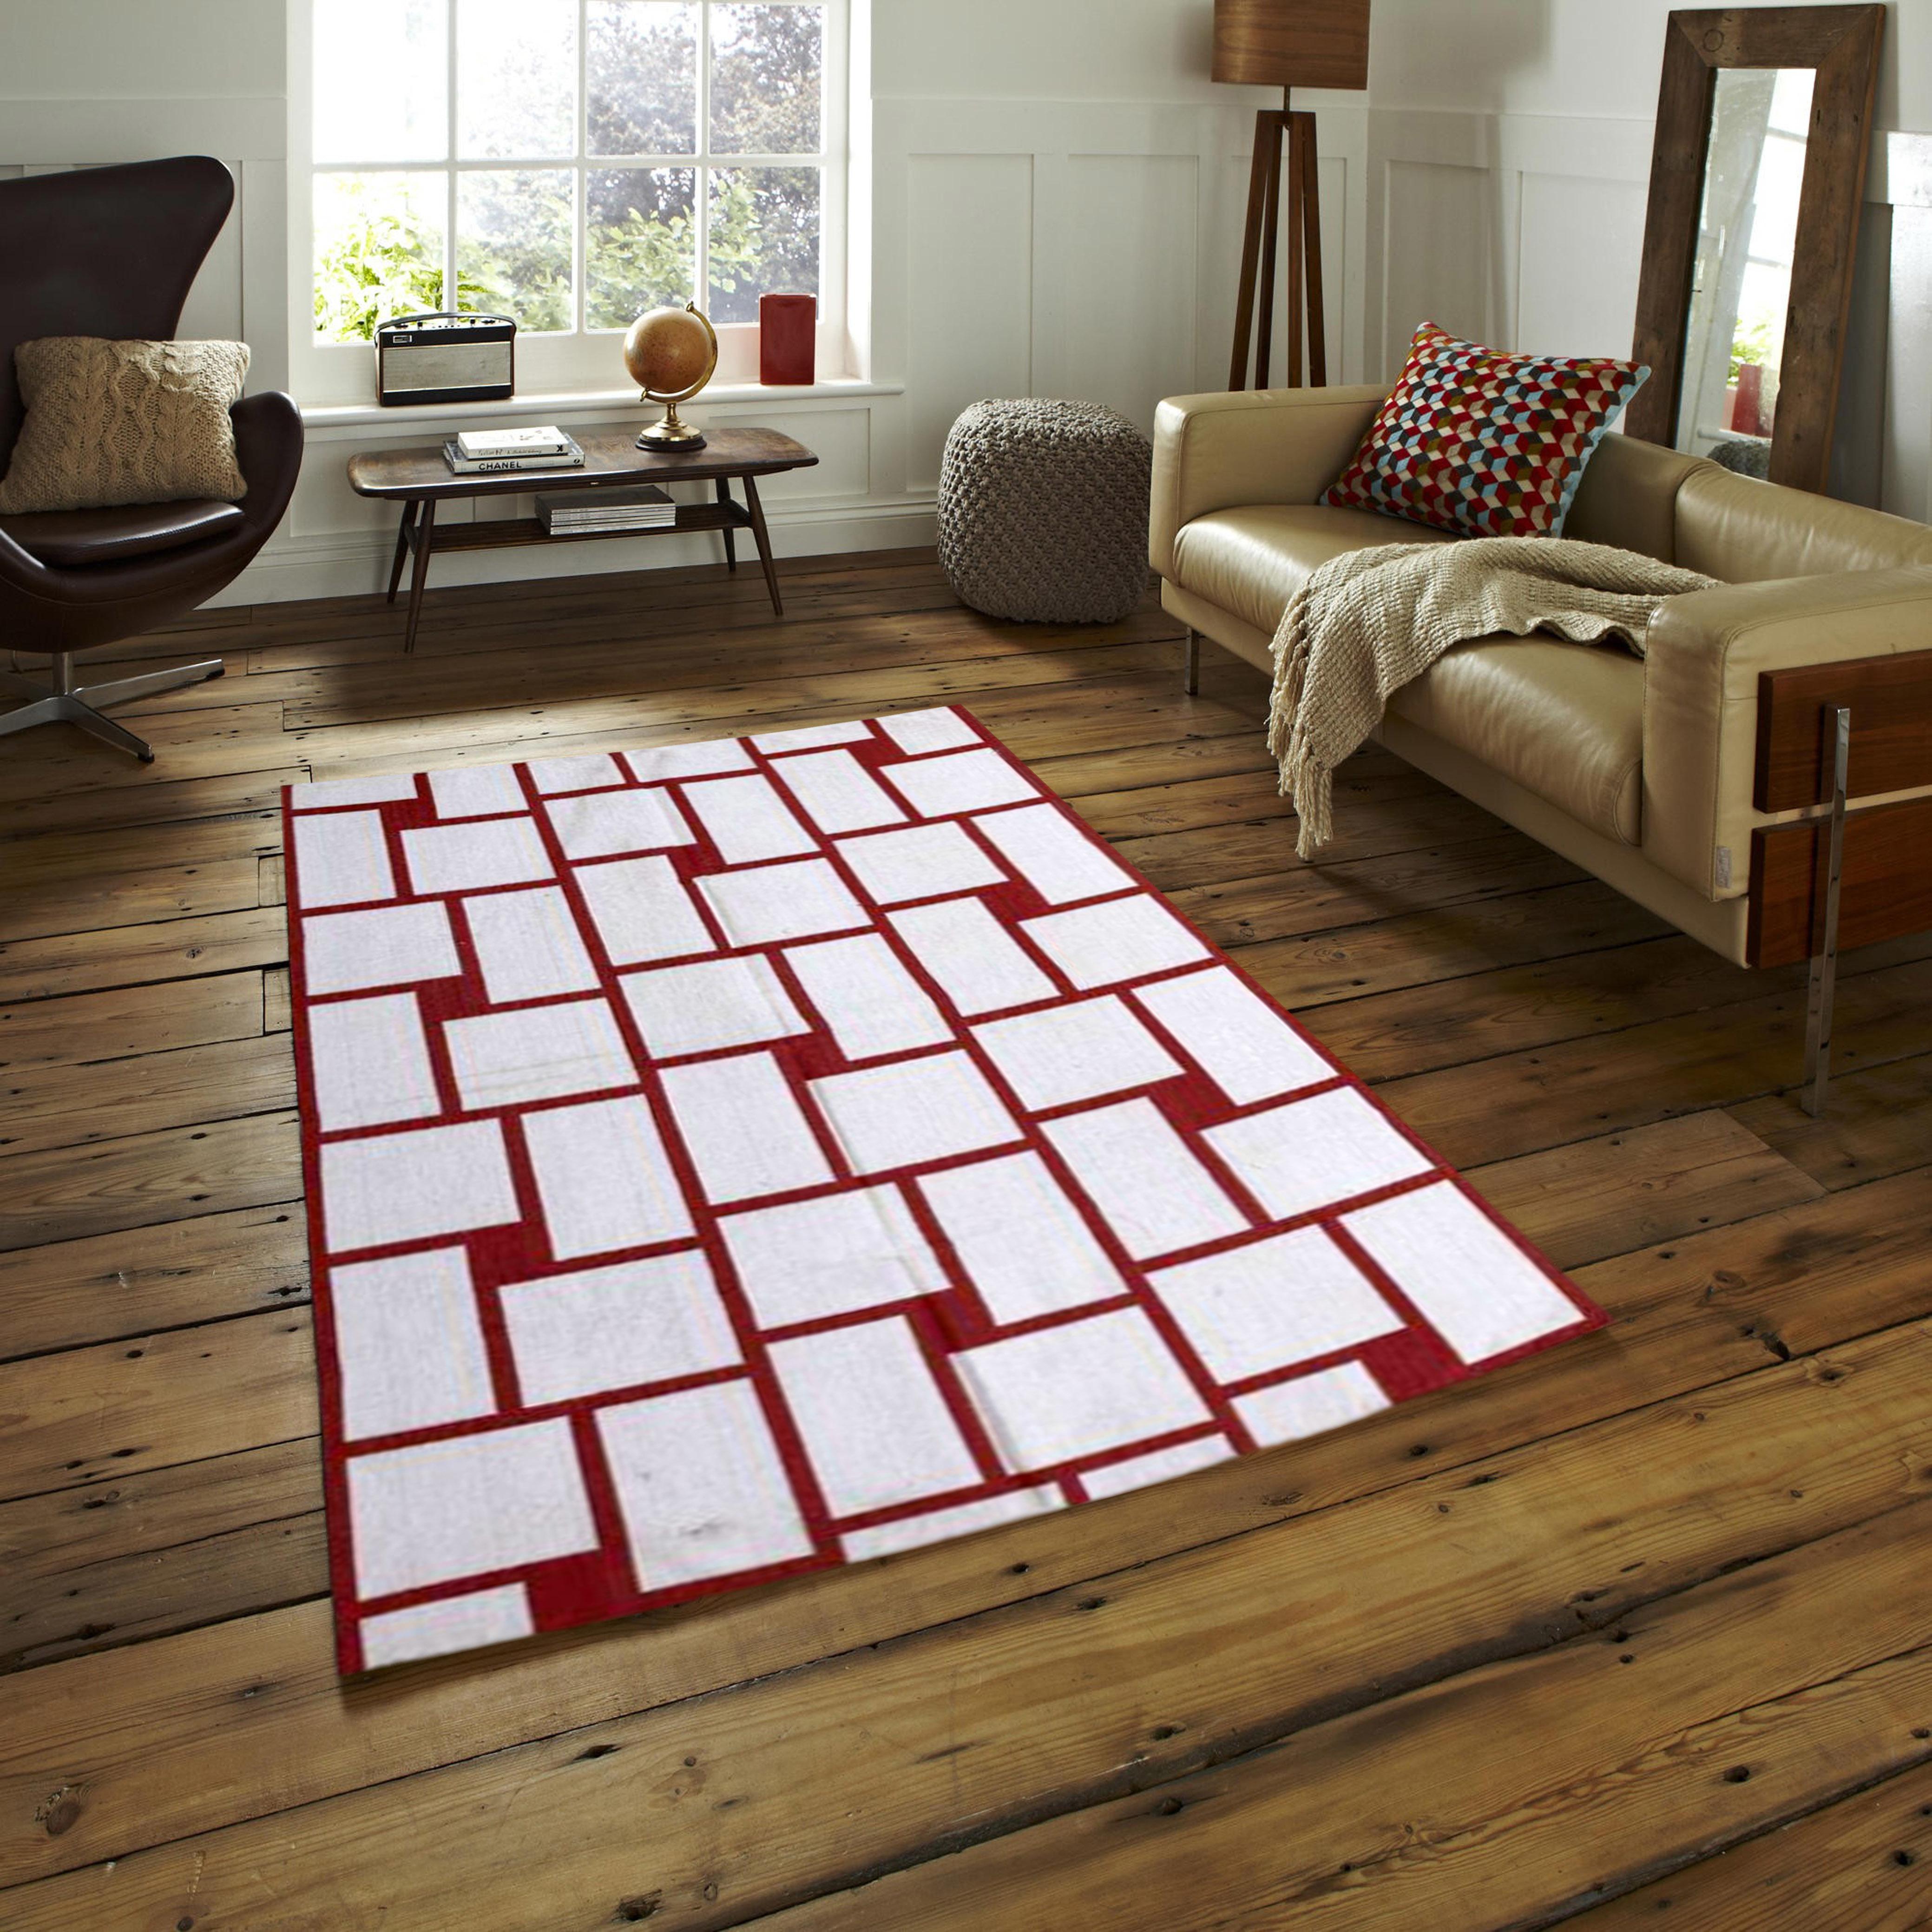 Floor Decorative Rug